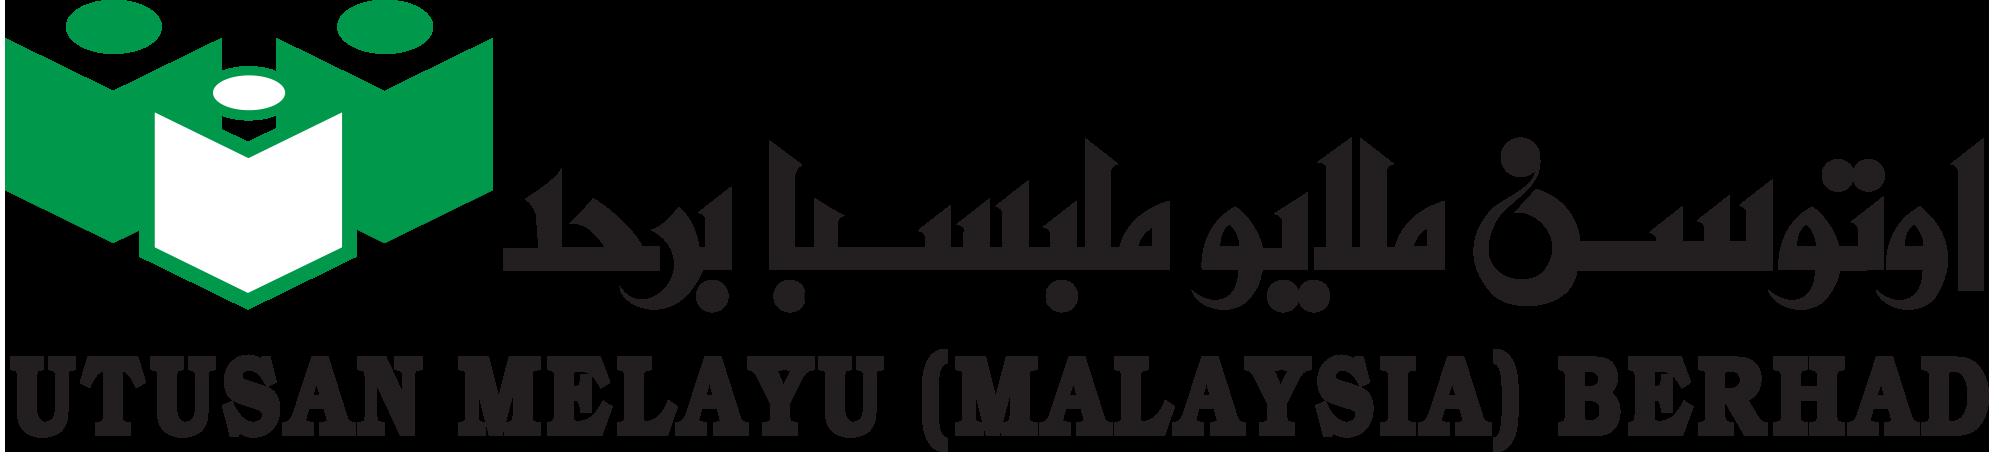 Utusan Melayu Bhd